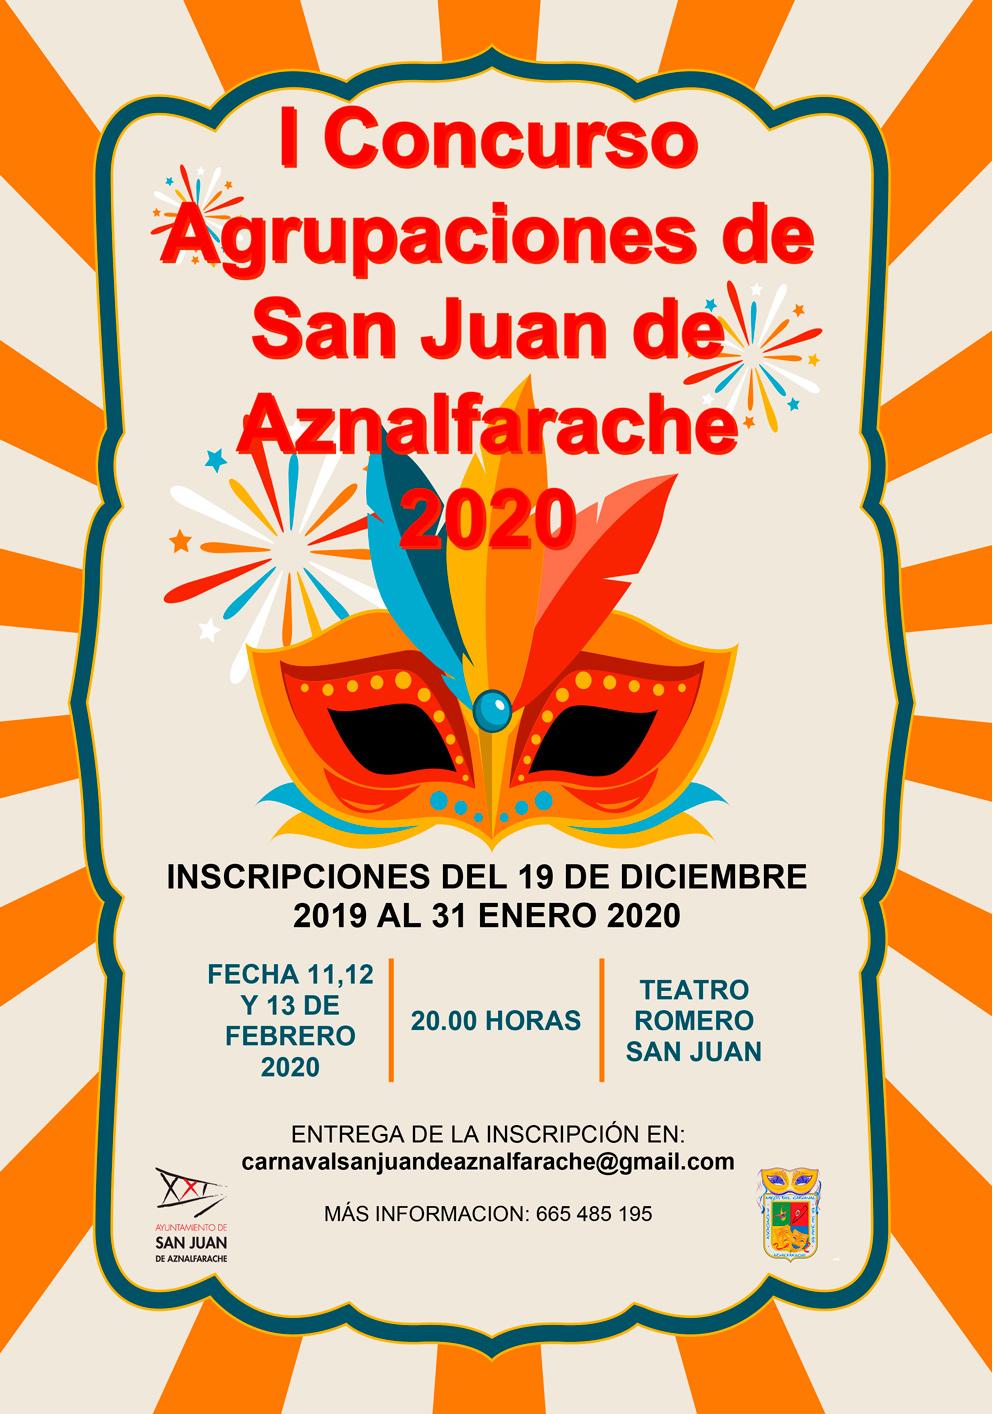 San Juan de Aznalfarache acogerá su I Concurso de Agrupaciones de Carnaval